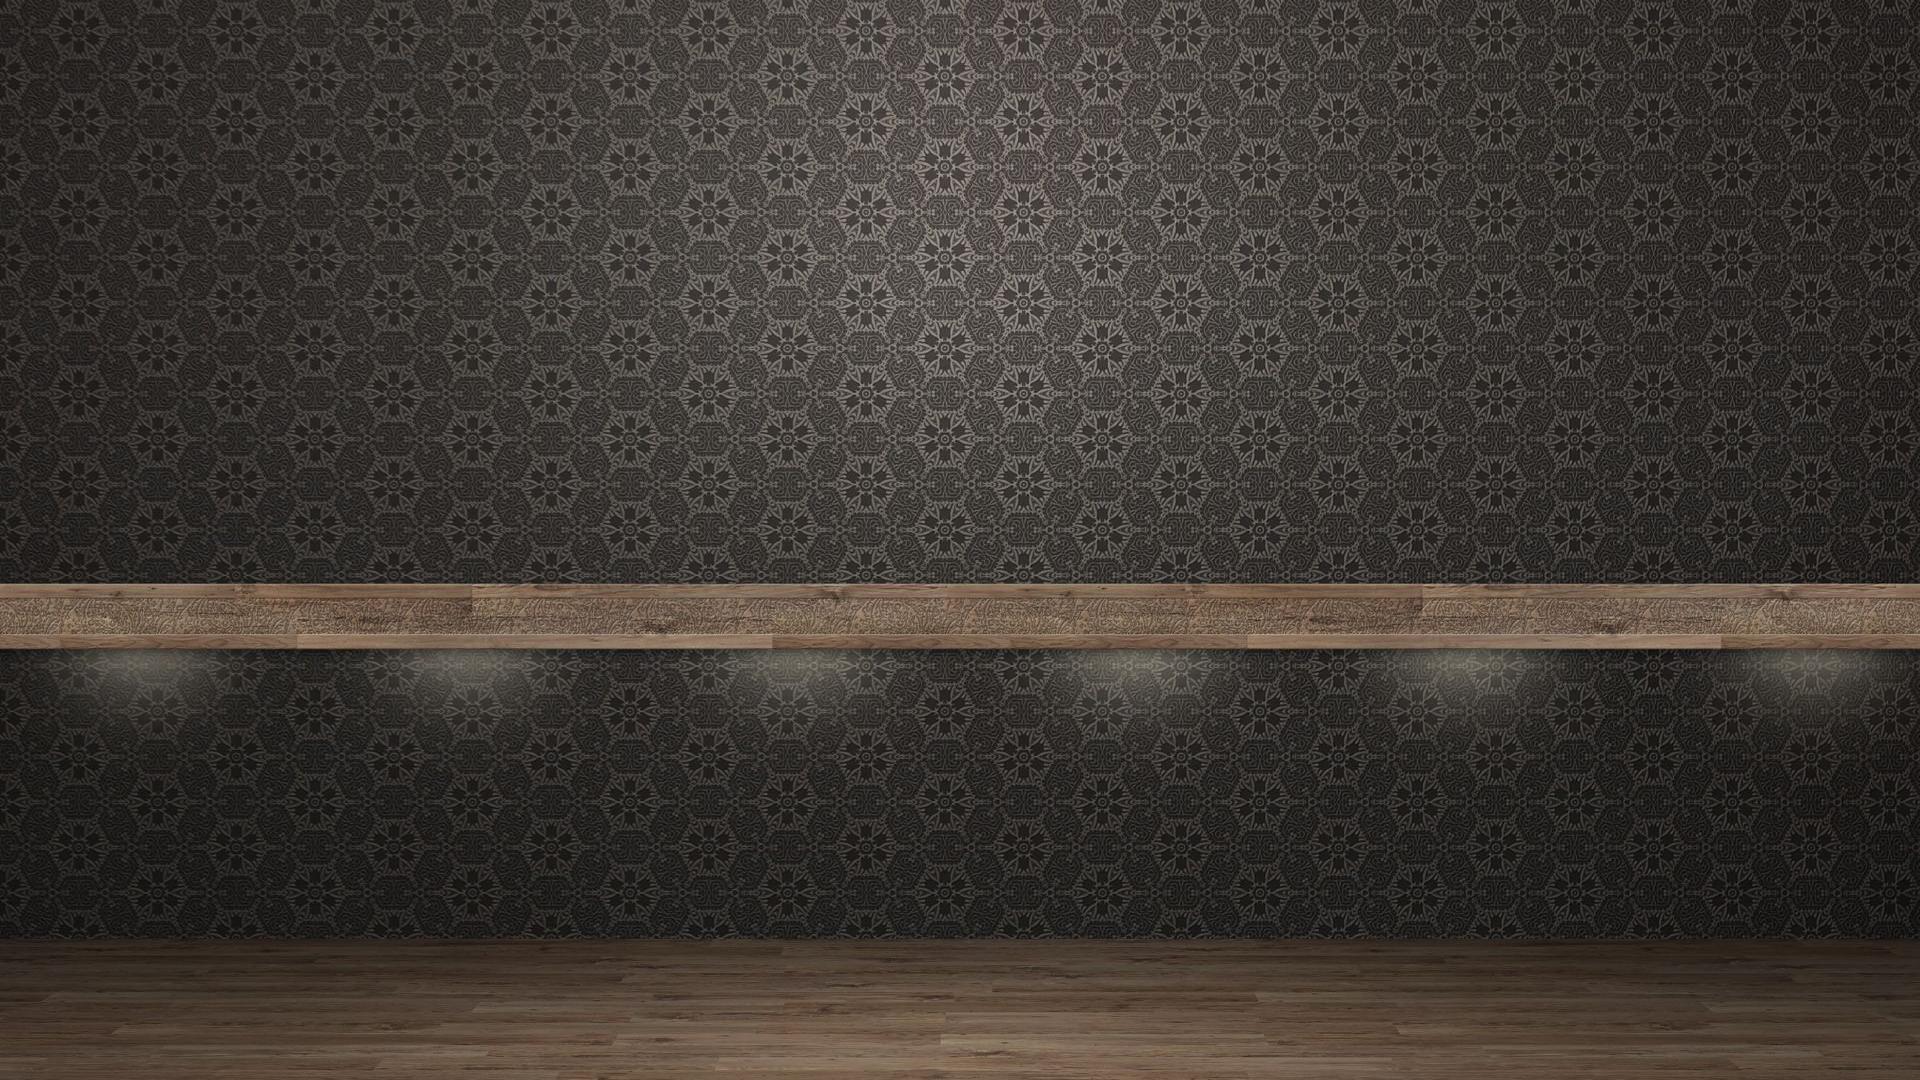 Floor Background For Desktop Widescreen and HD background Wallpaper 1920x1080